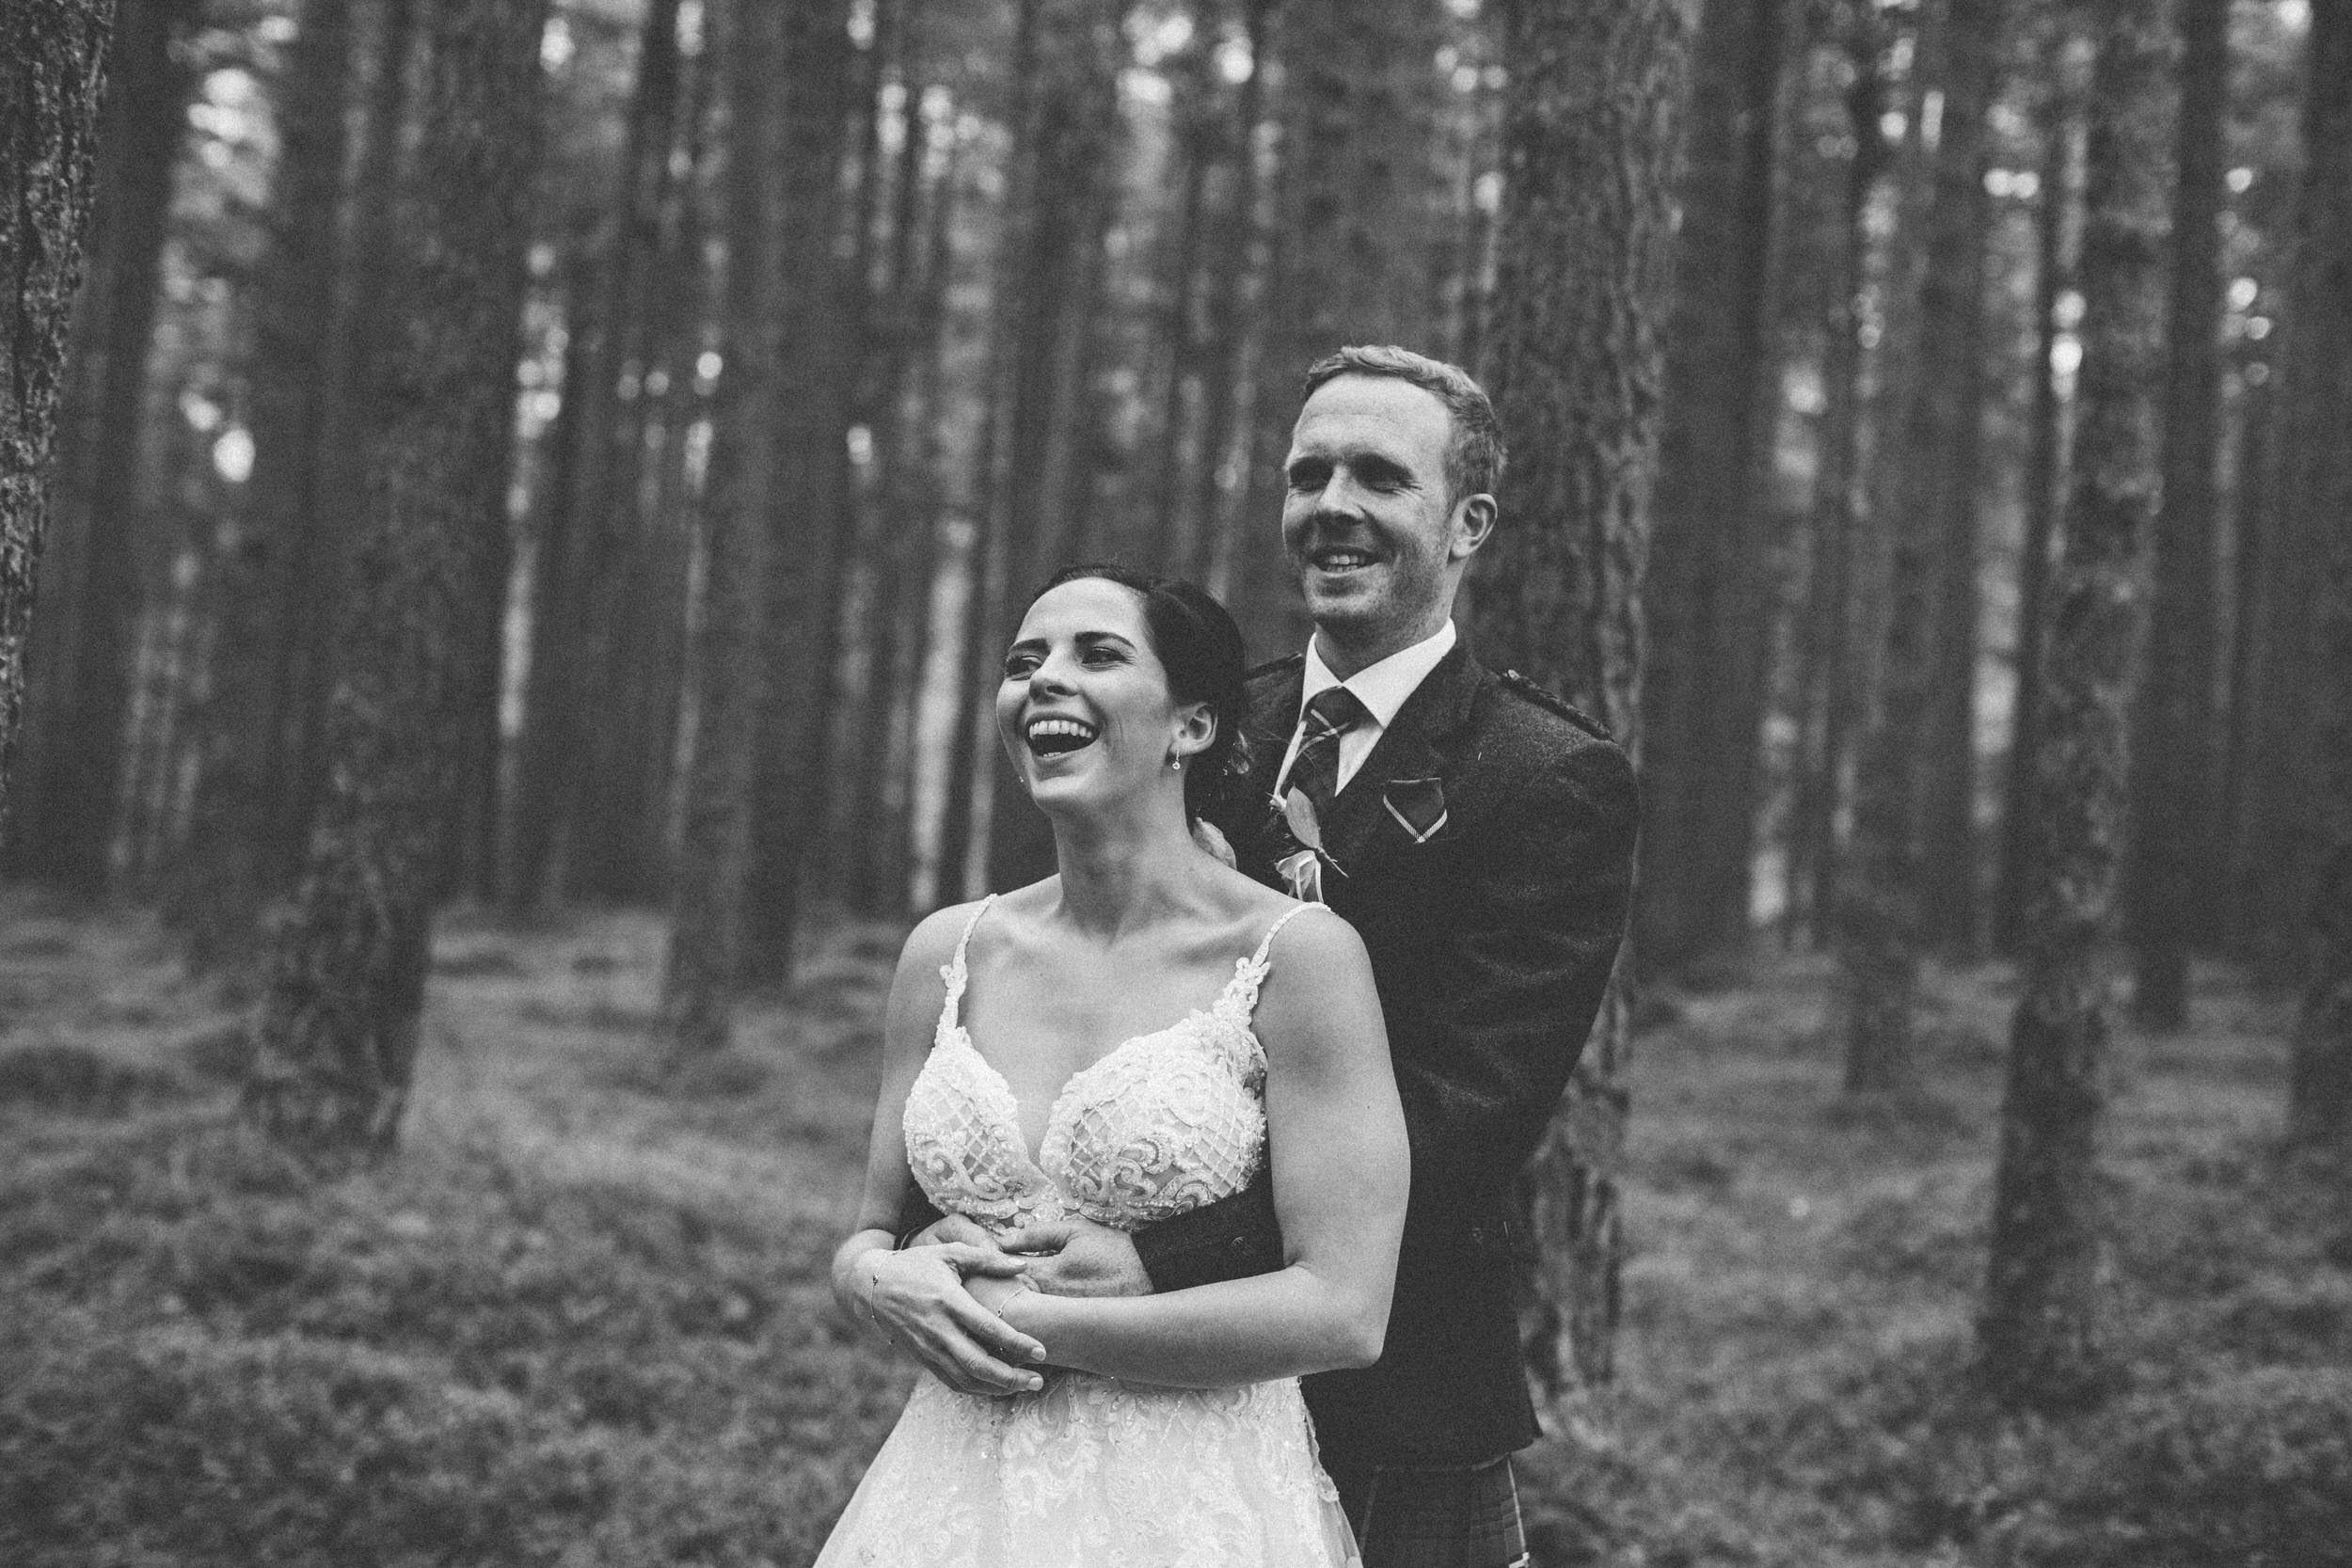 Quirky Wedding Photographer Scotland Glasgow Edinburgh Mirrorbox 093.jpg